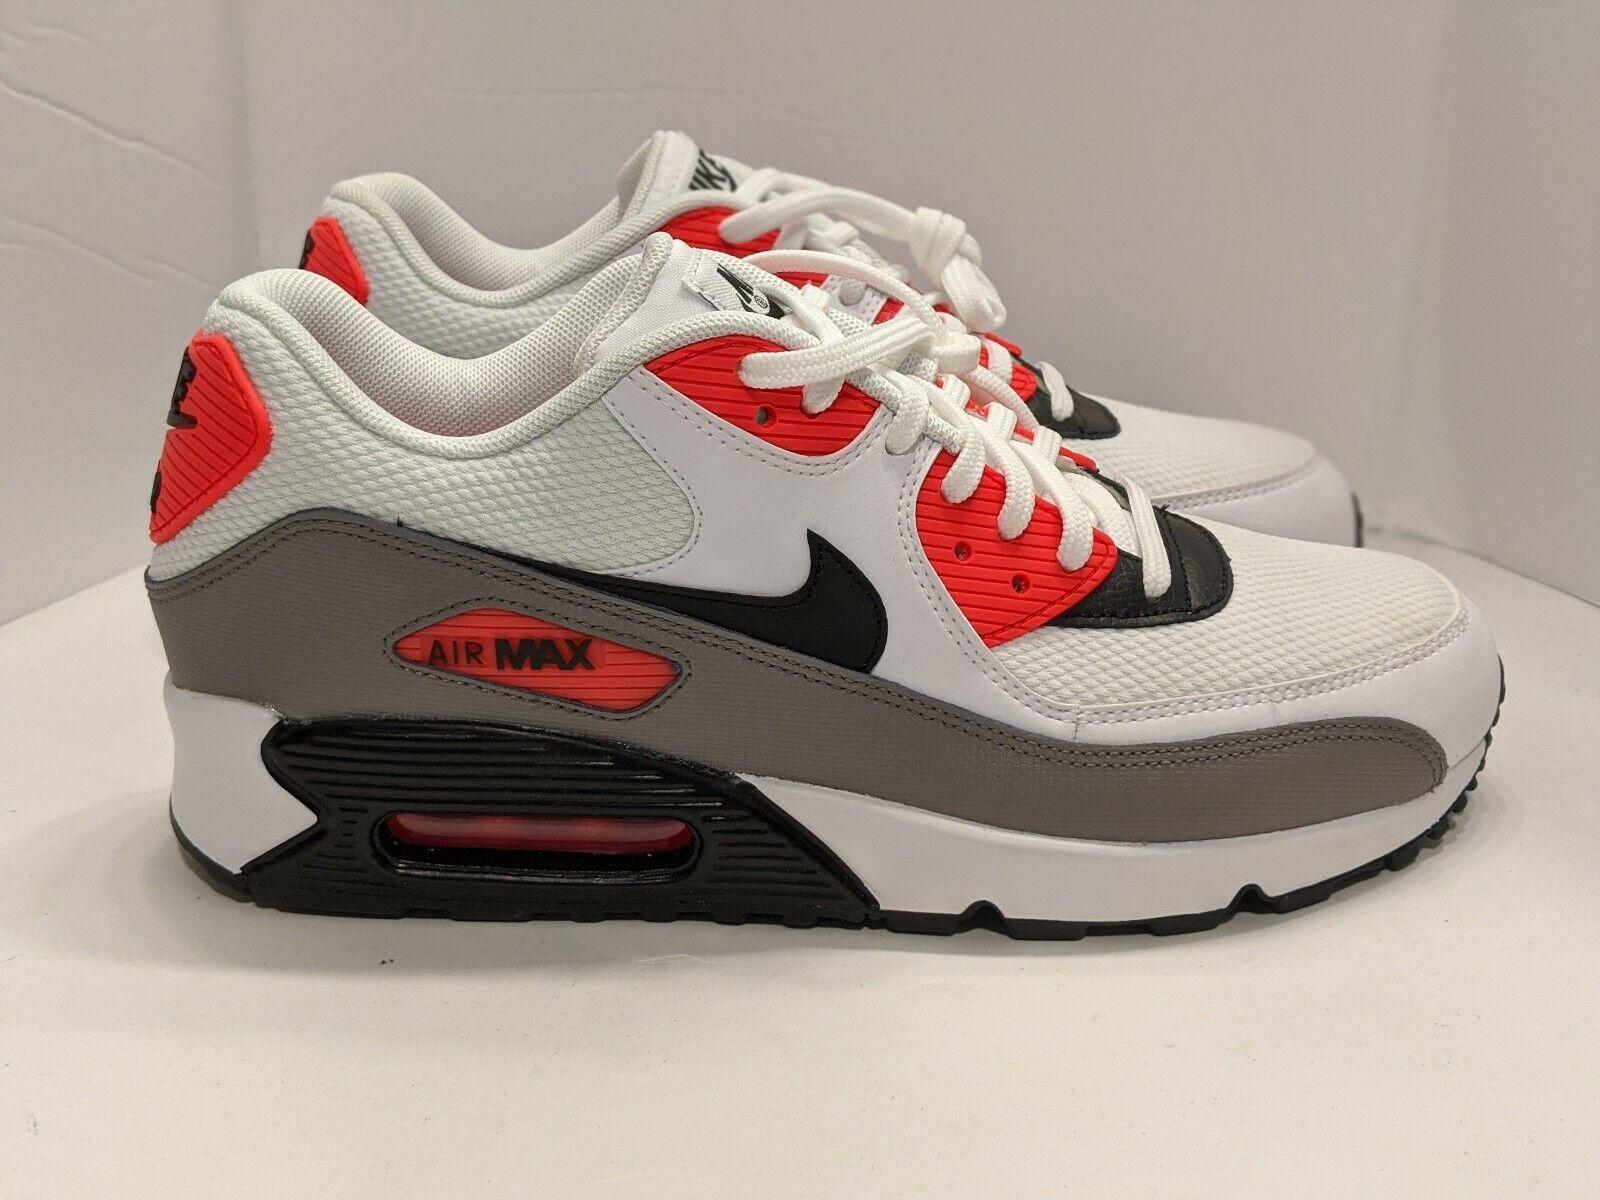 Nike Air Max 90 Solar Red White Black 325213 132 Women S Size 10 5